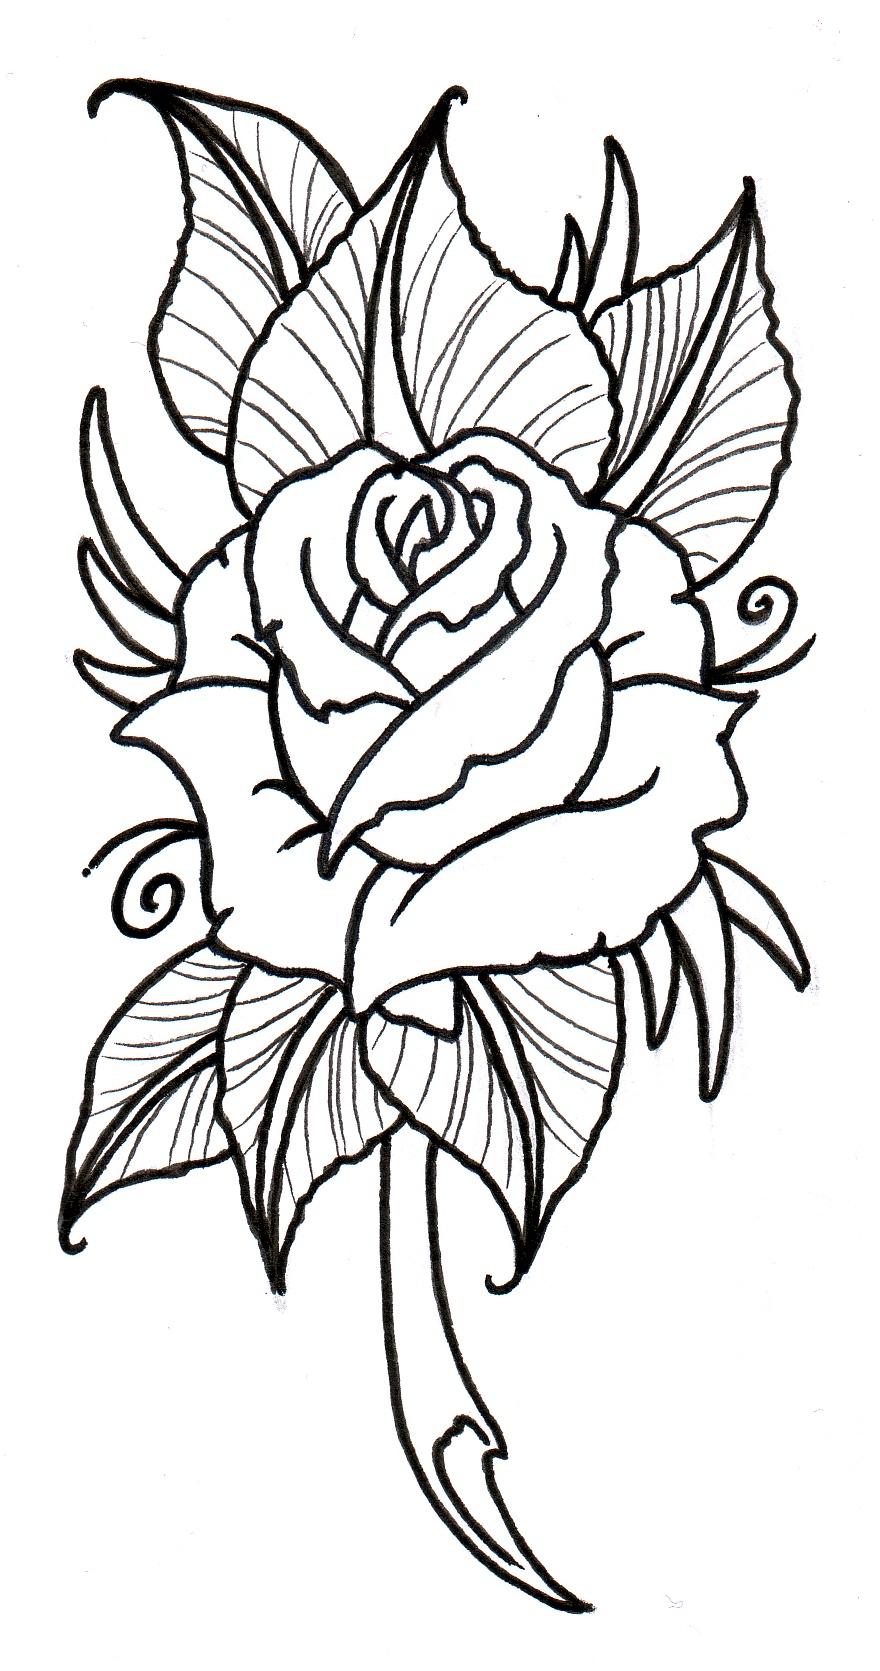 Flower bouquet clipart black and white free download best flower 880x1671 rose black and white white rose bouquet clipart izmirmasajfo